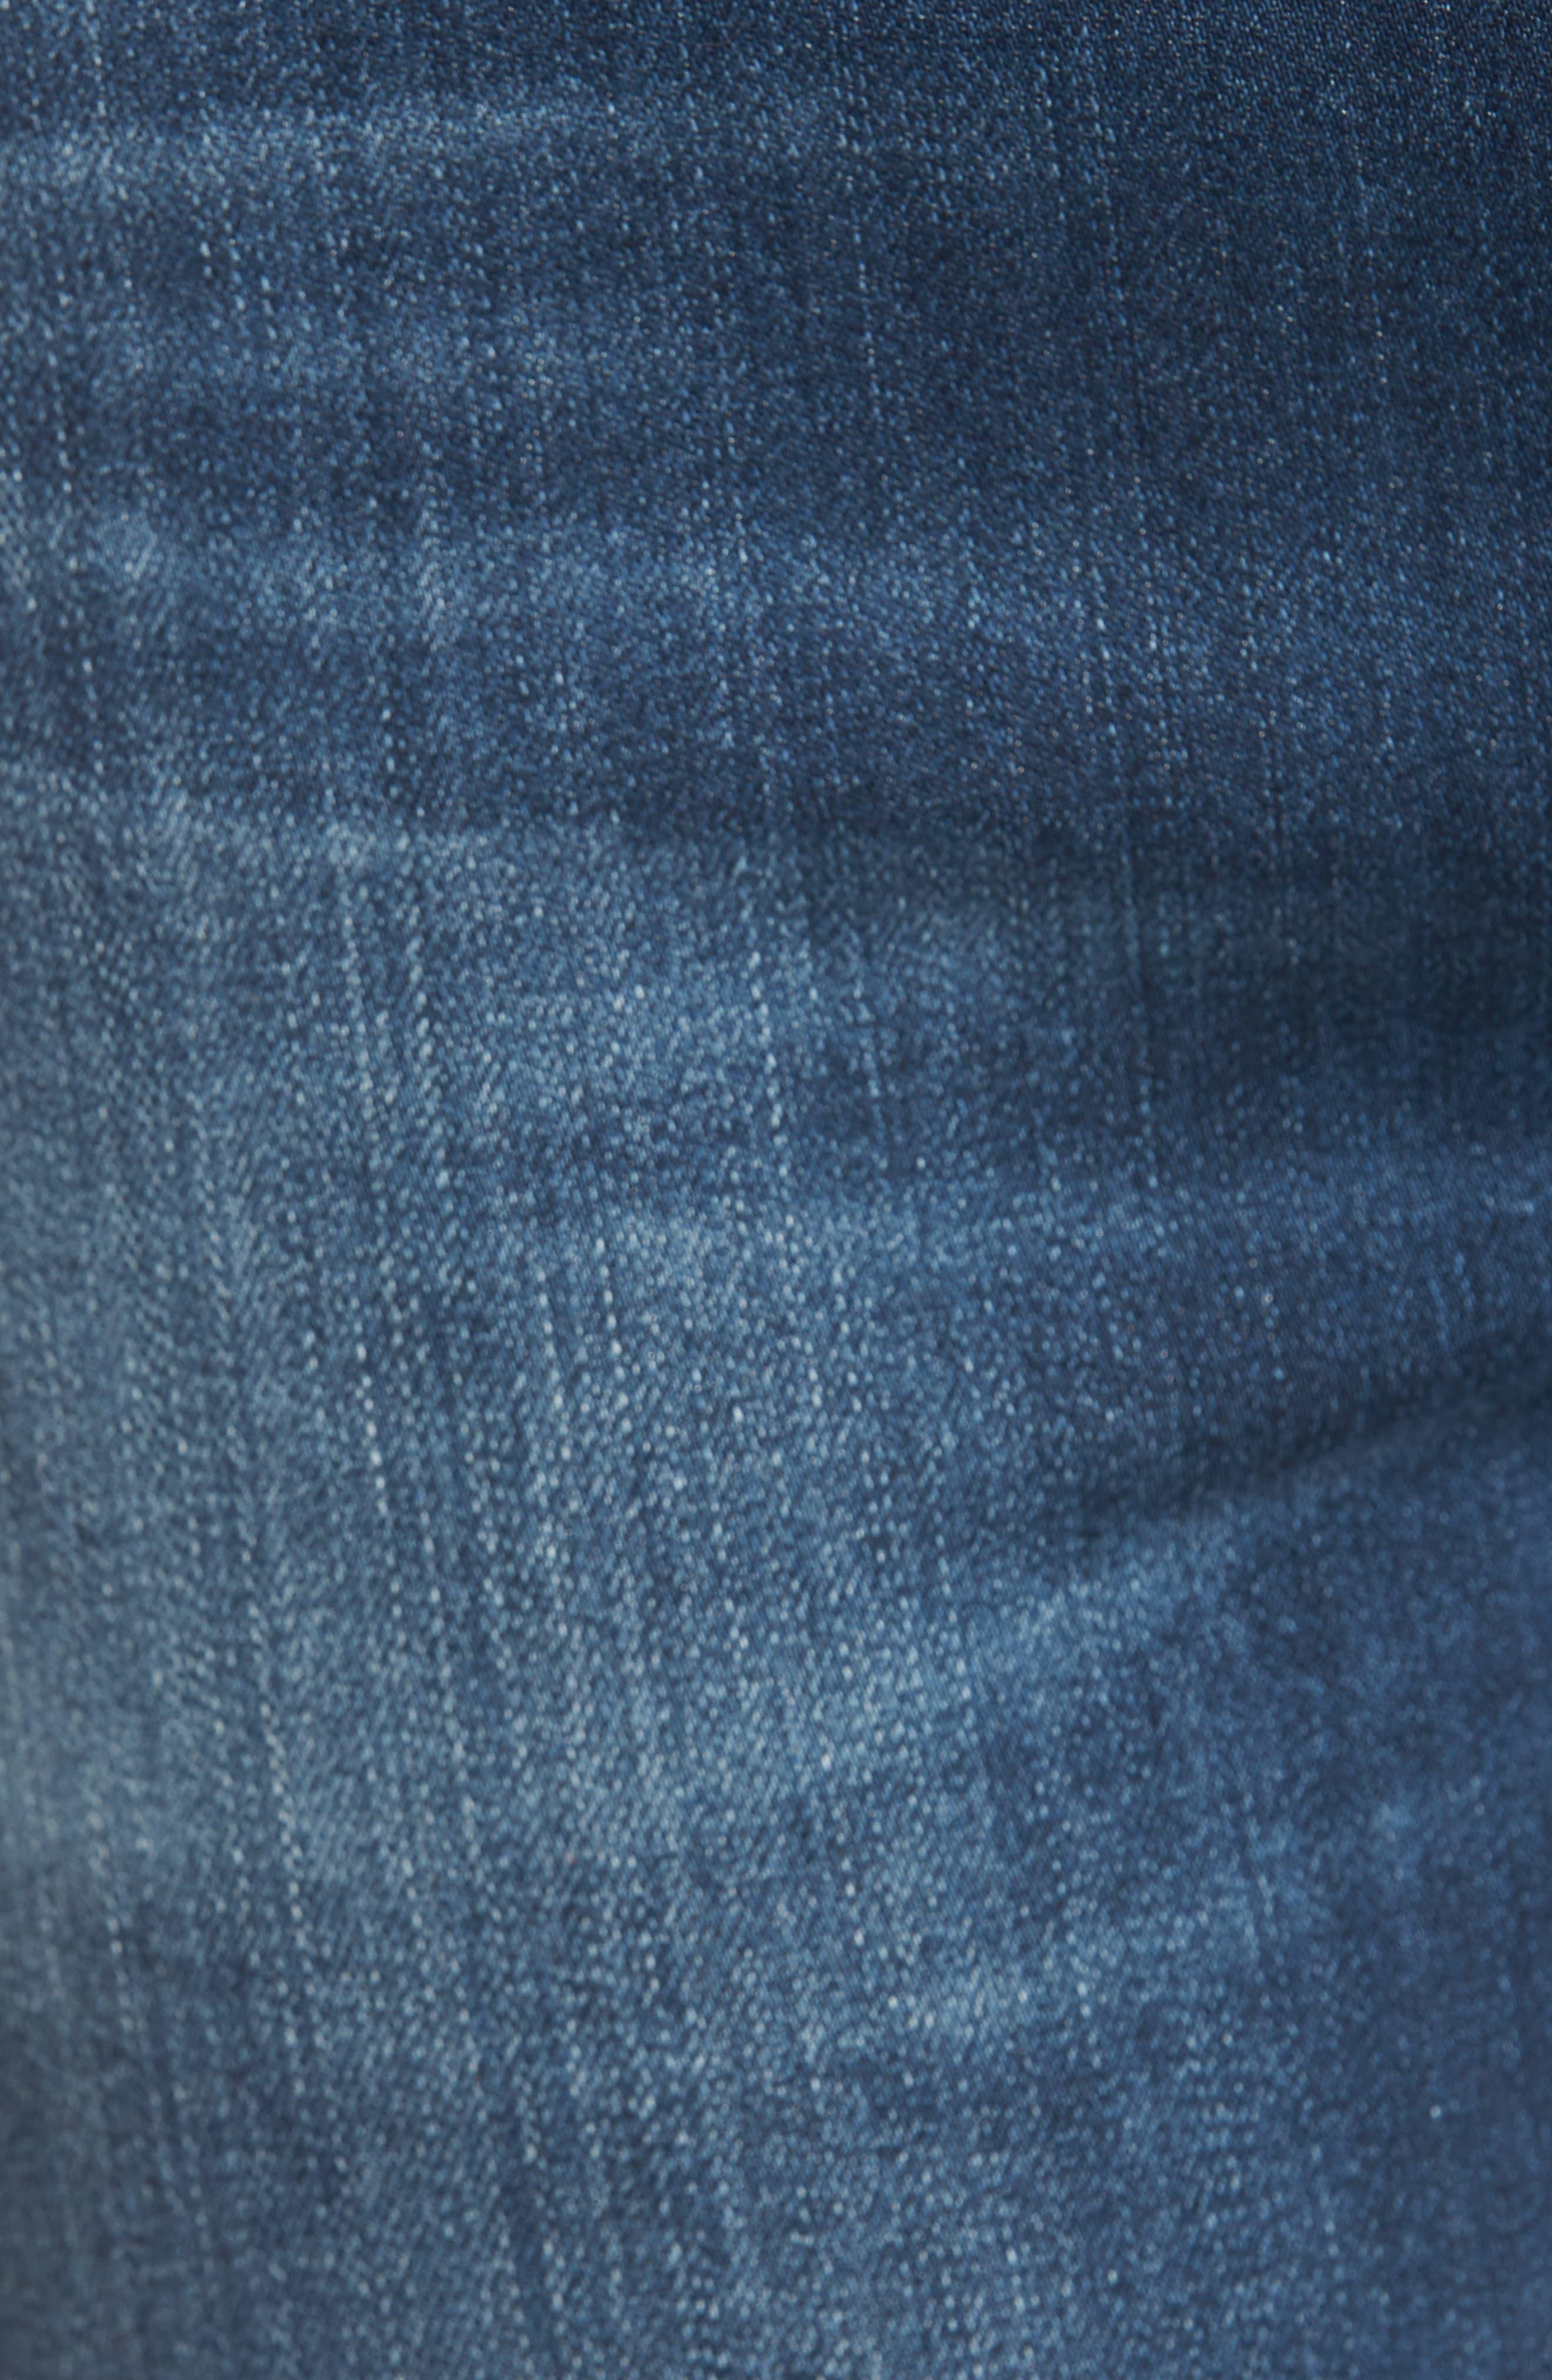 Rocket Split Hem Ankle Skinny Jeans,                             Alternate thumbnail 5, color,                             402